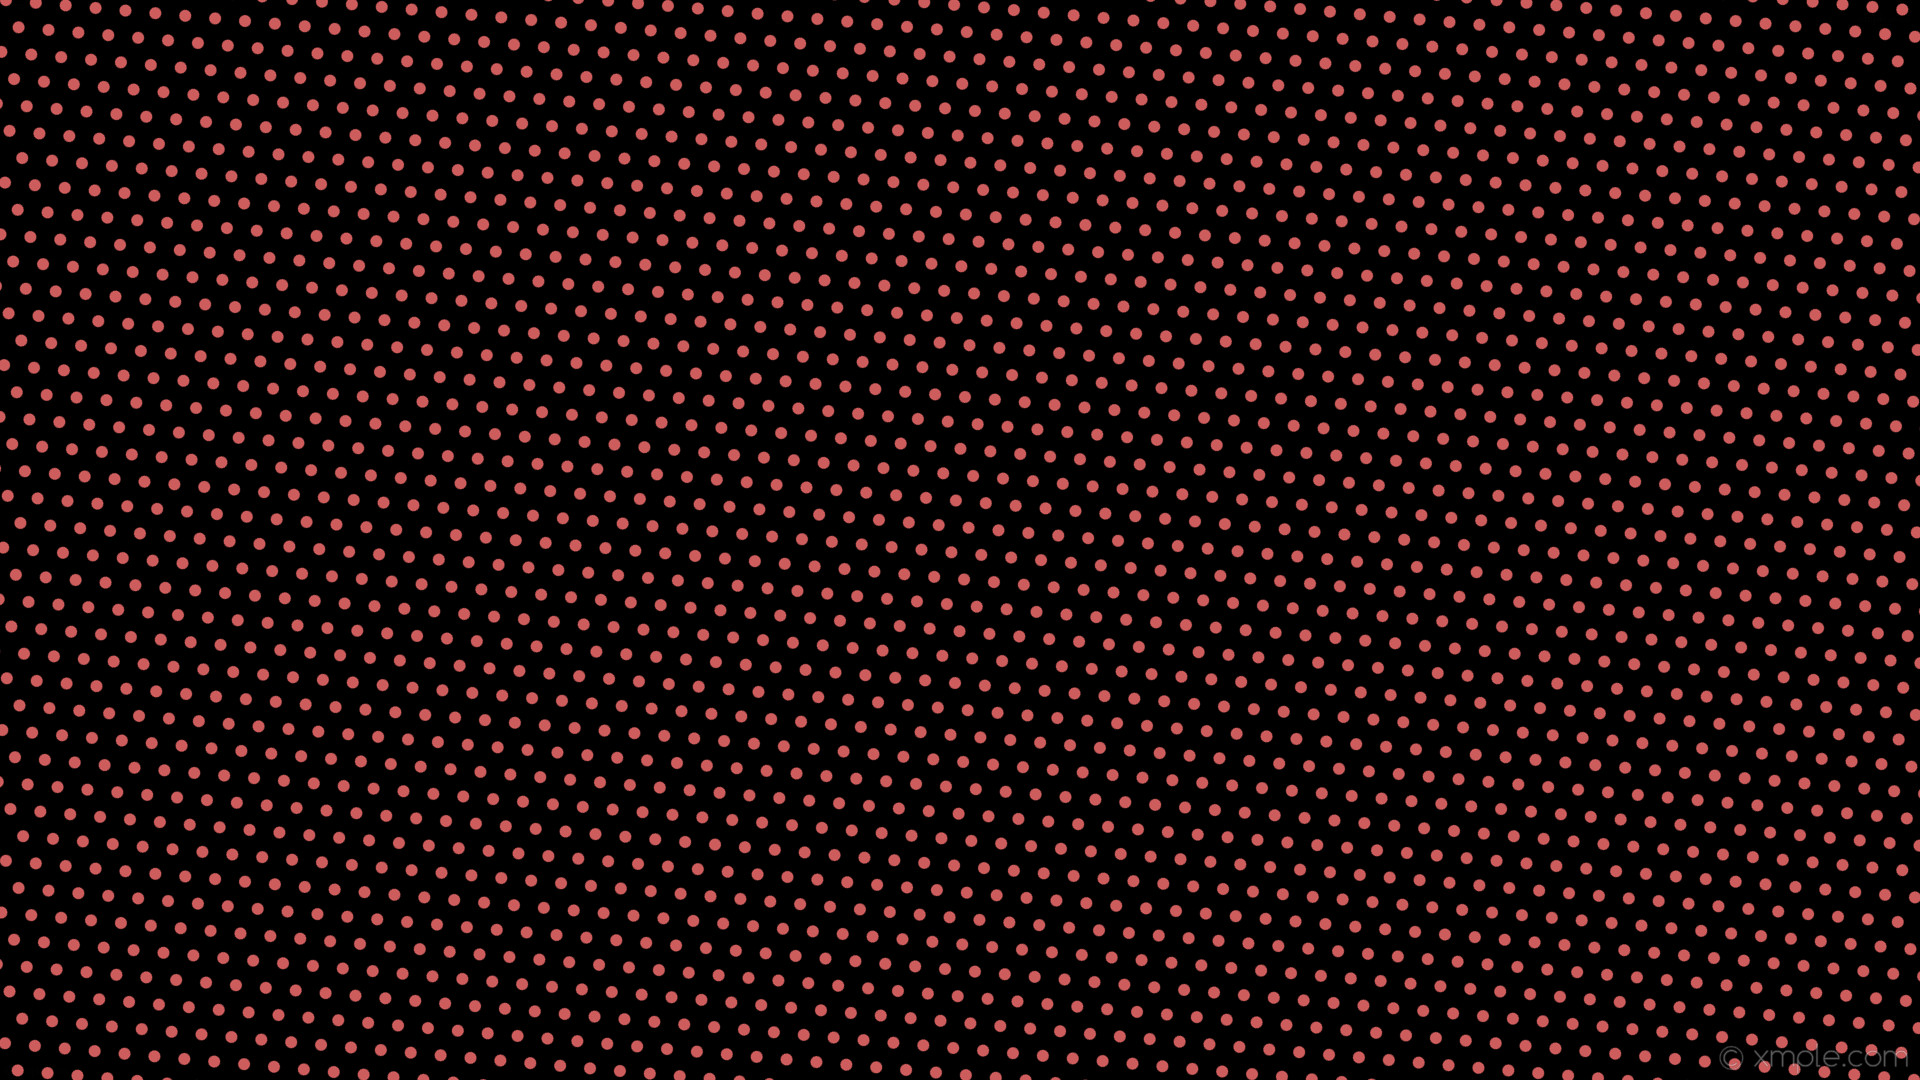 wallpaper red black hexagon polka dots indian red #000000 #cd5c5c diagonal  55° 12px